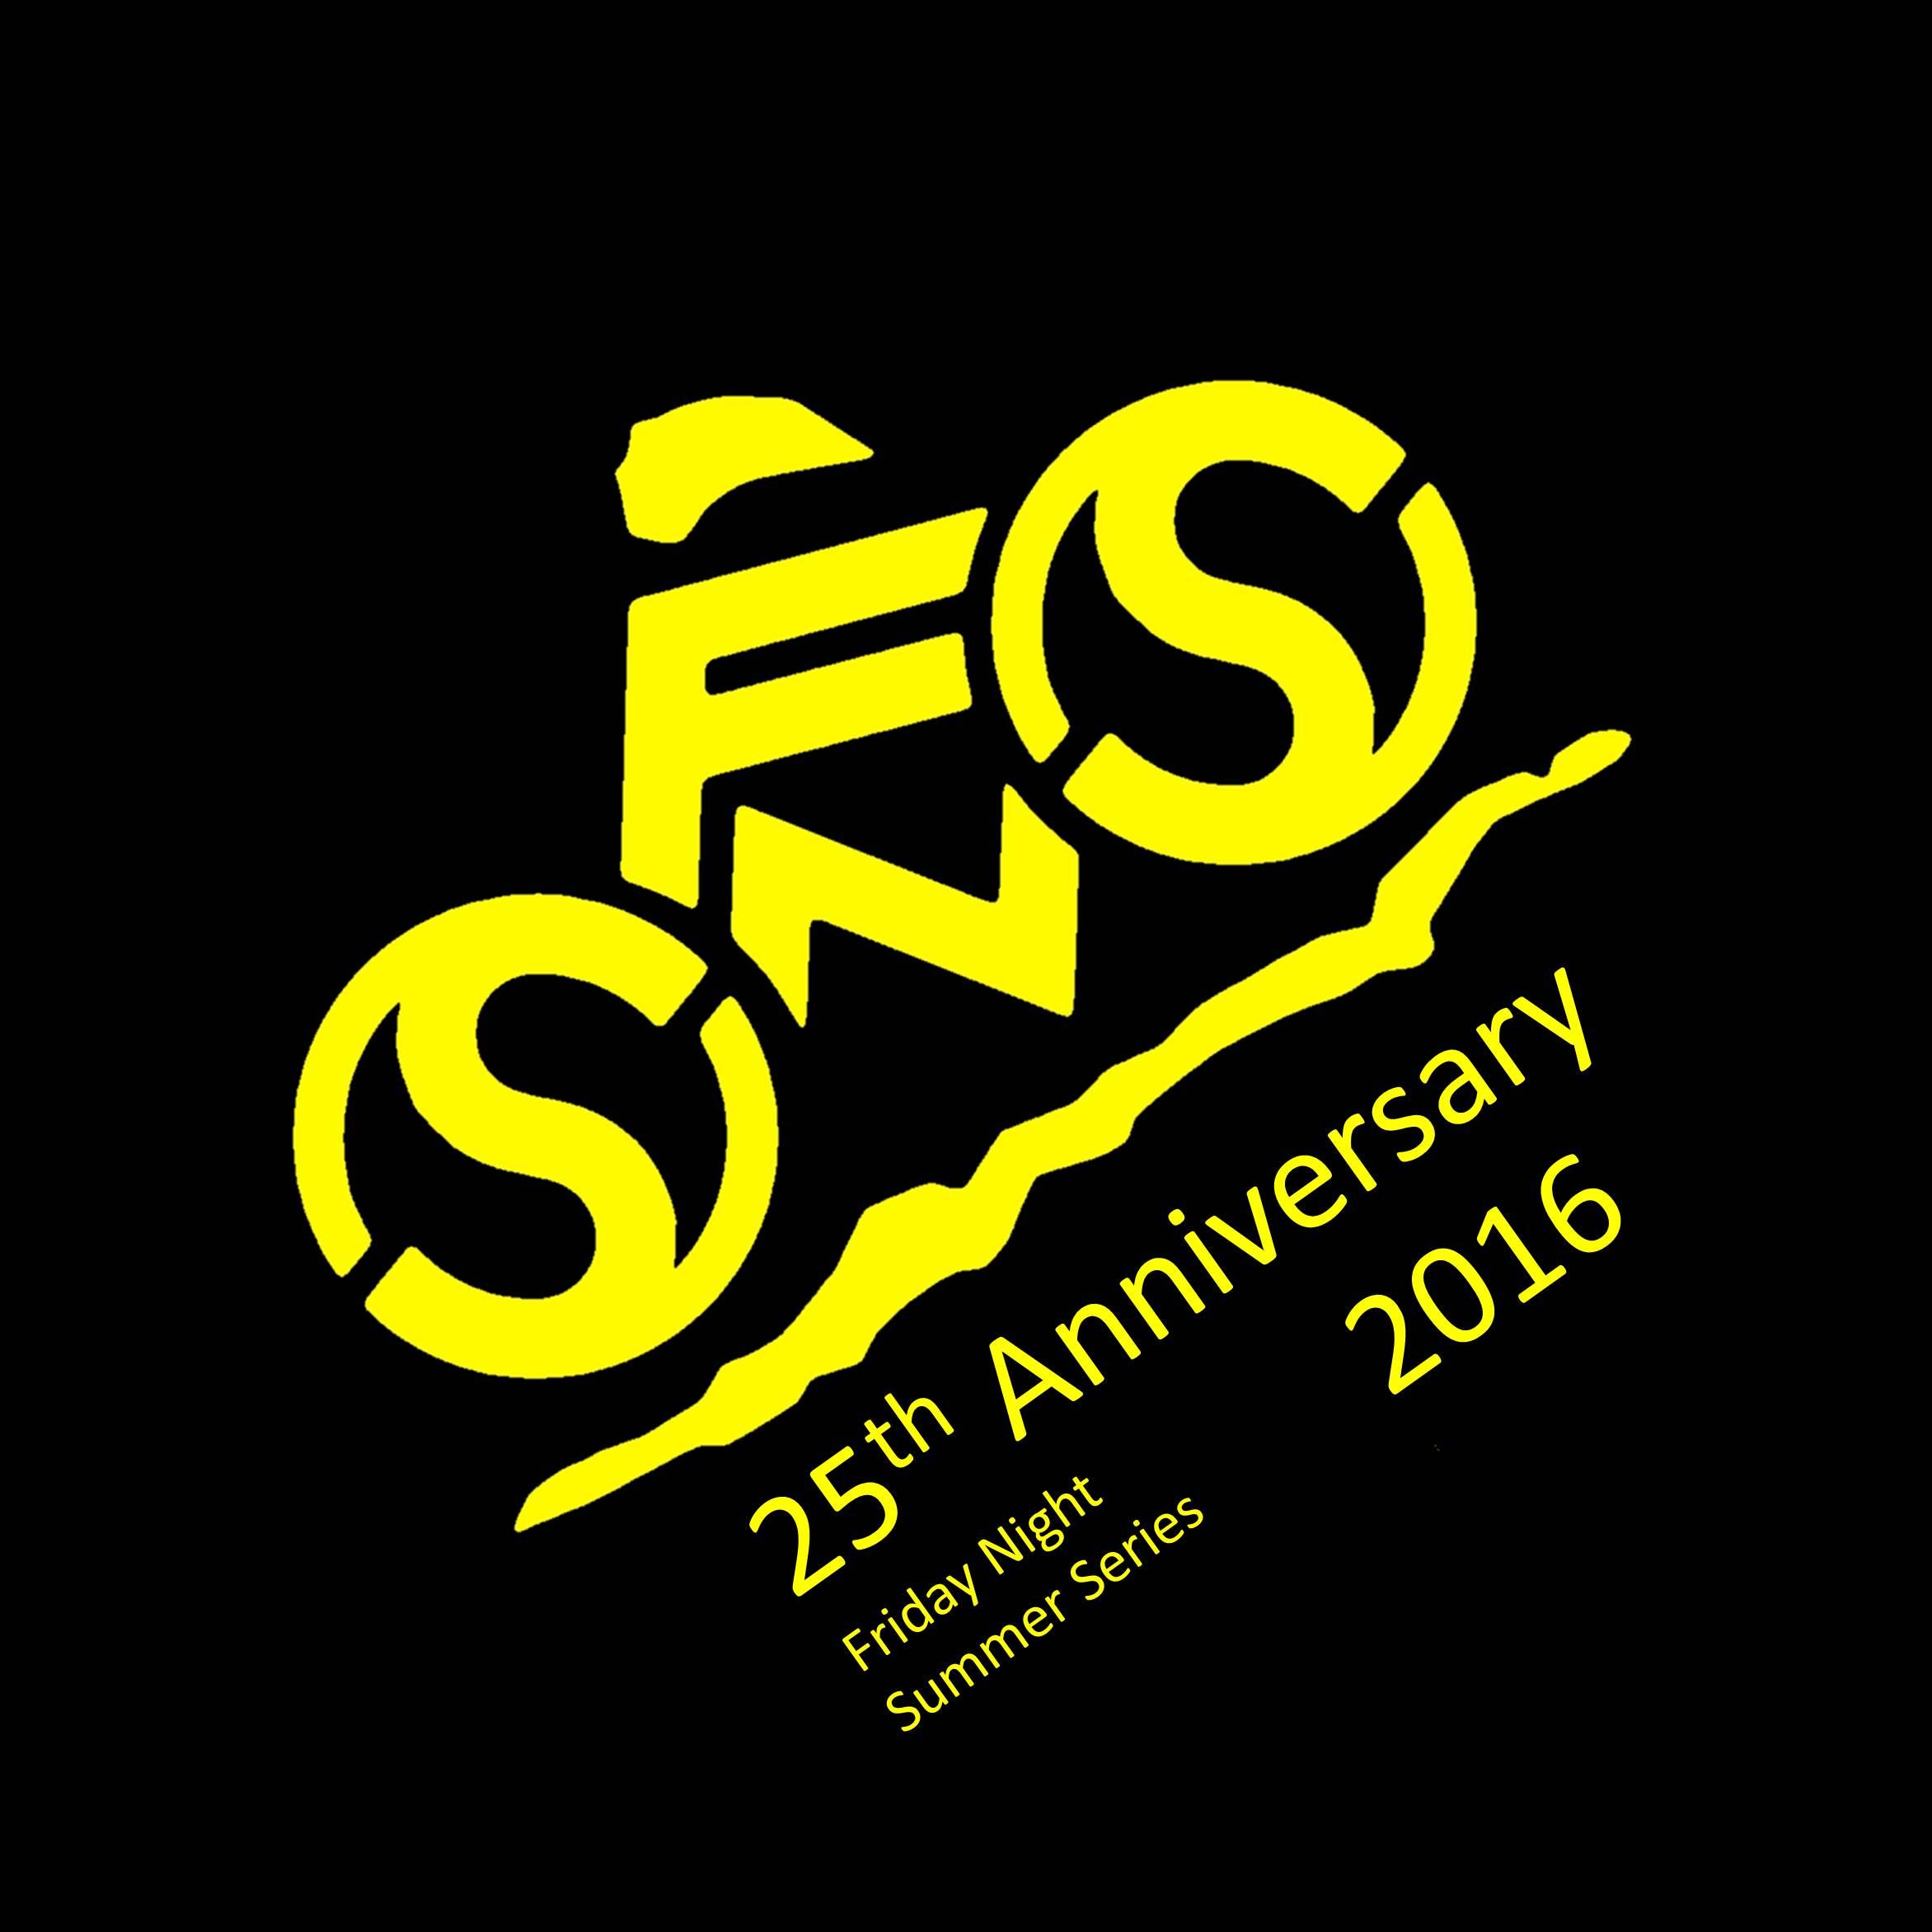 FNSS 2016 Round 2 Shuckburgh cancelled